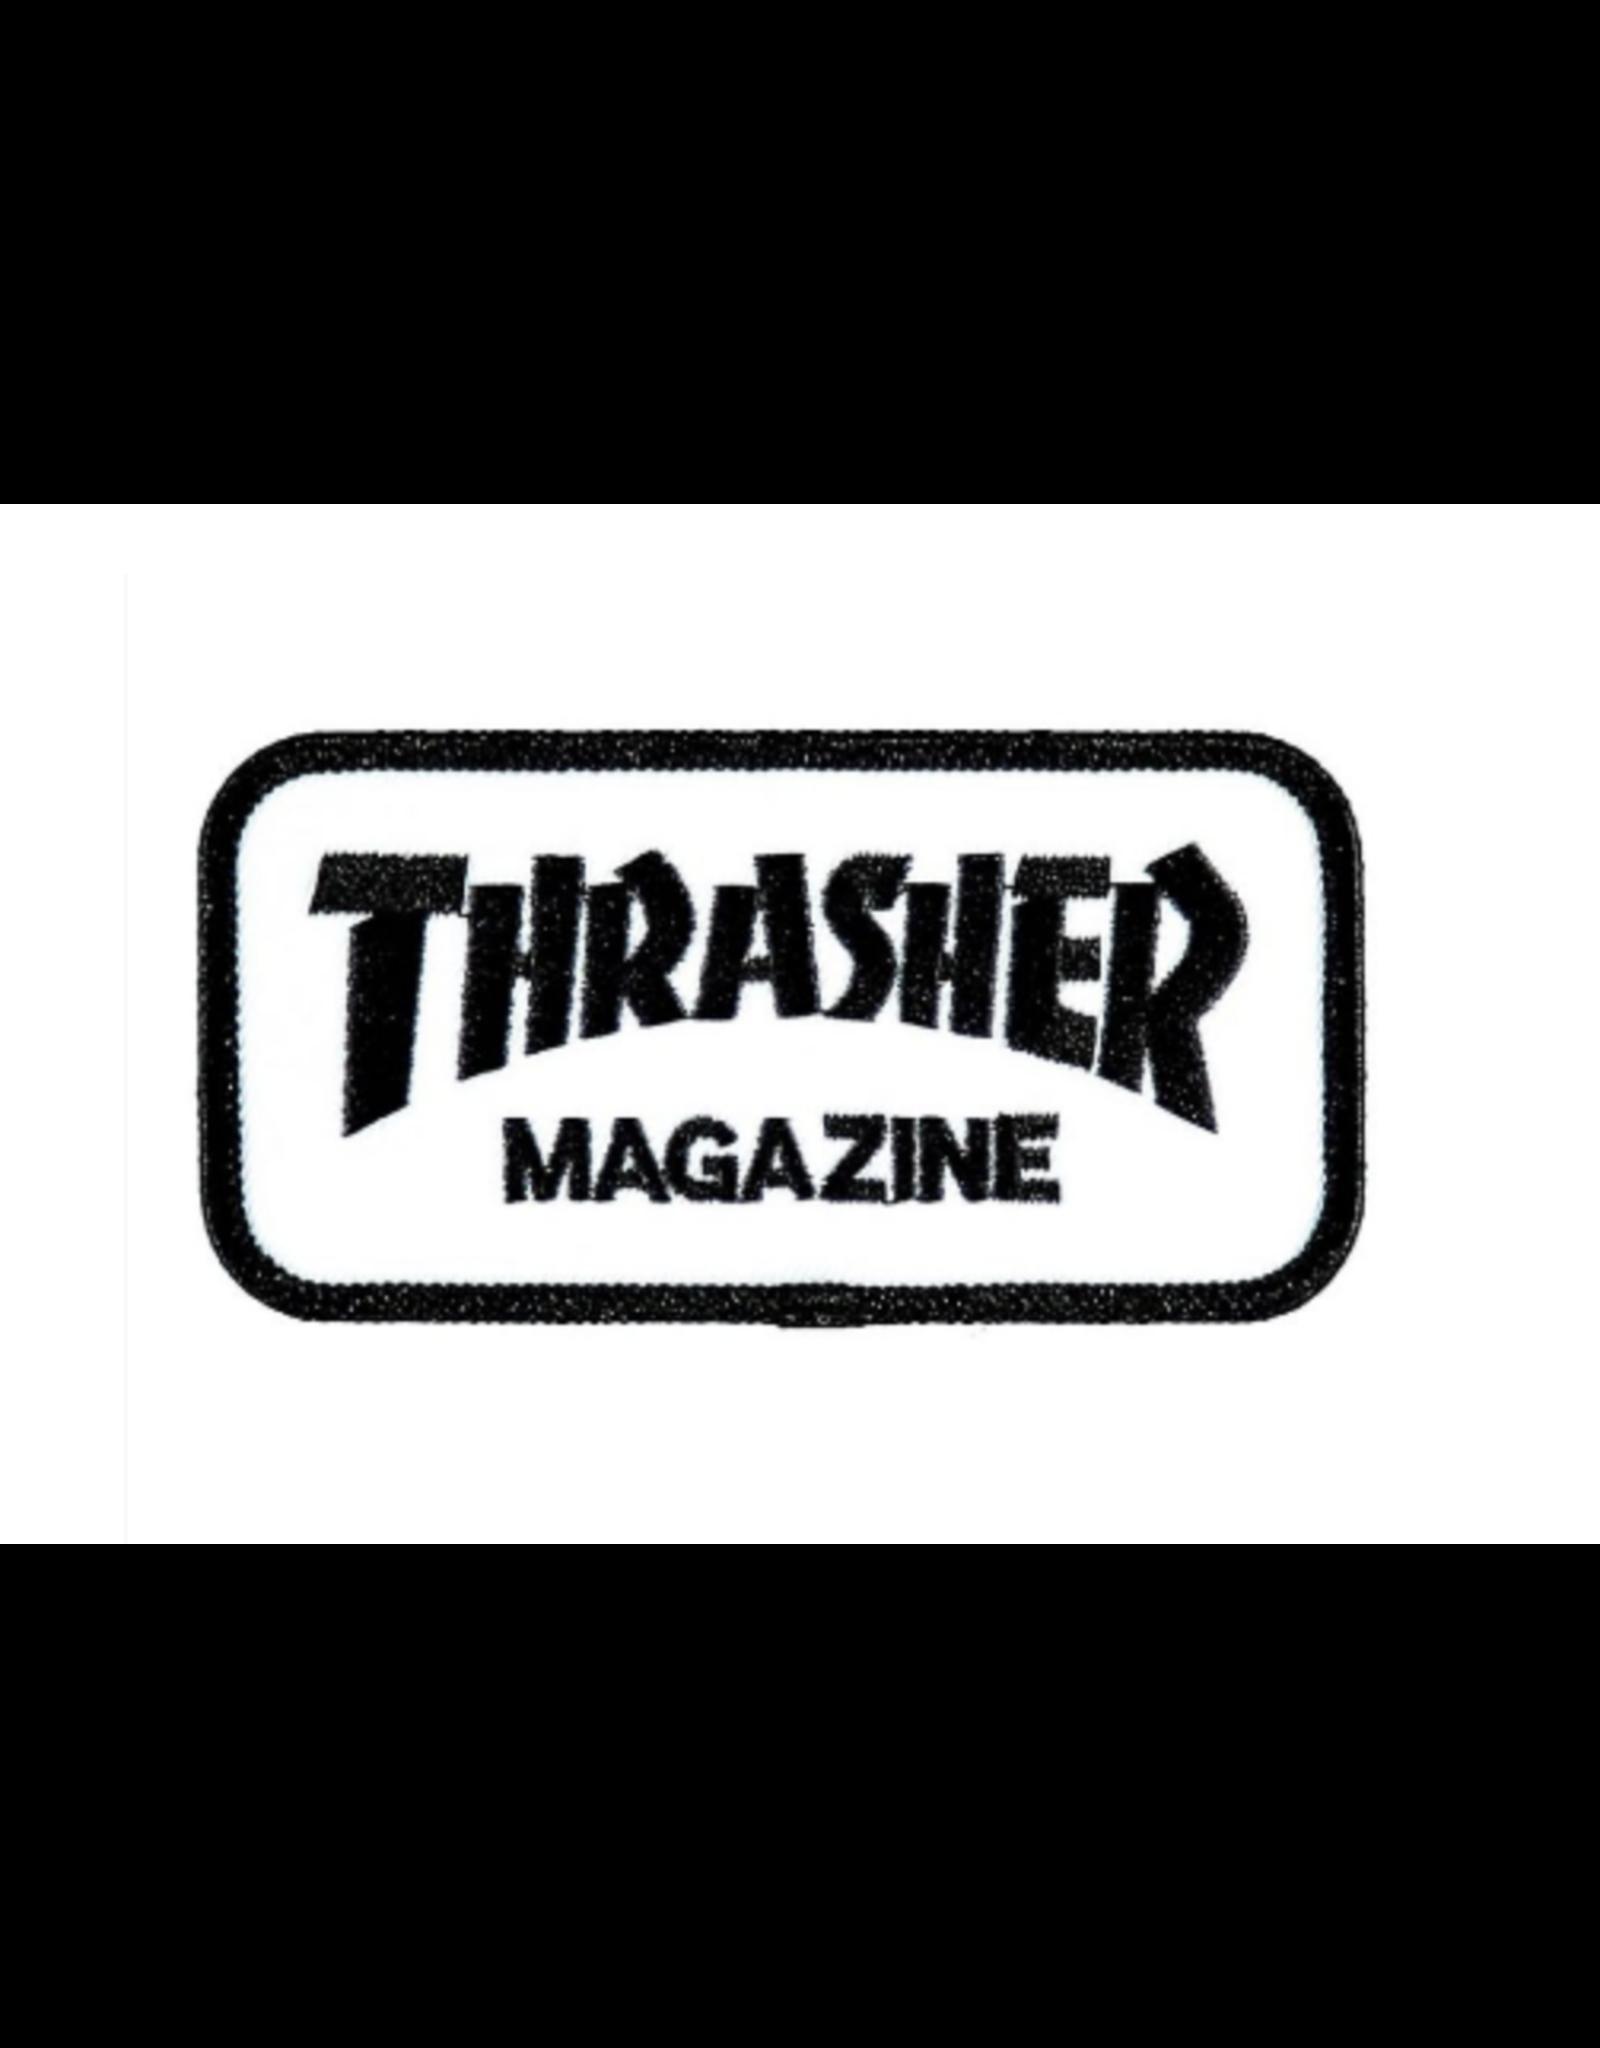 Thrasher Skate Mag Patch - White